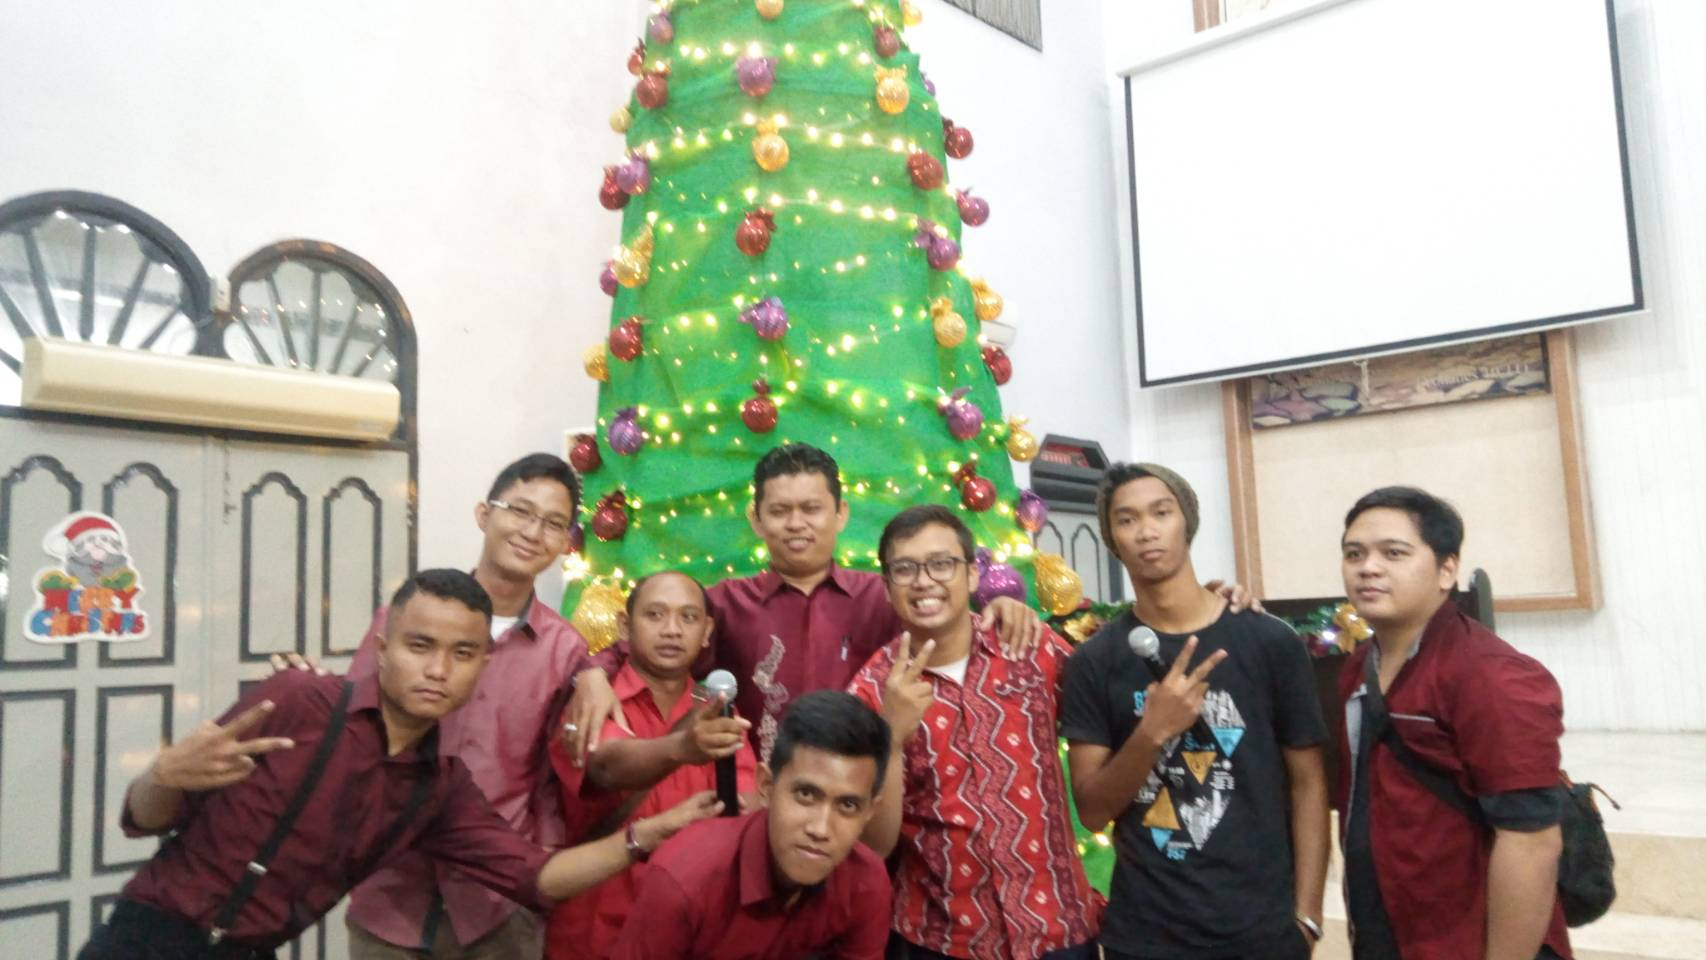 "Jemaat GP.GPIB Immanuel Pekanbaru Melaksanakan Perayaan Natal Dengan Mengusung Tema "" Saling Berbagi"""